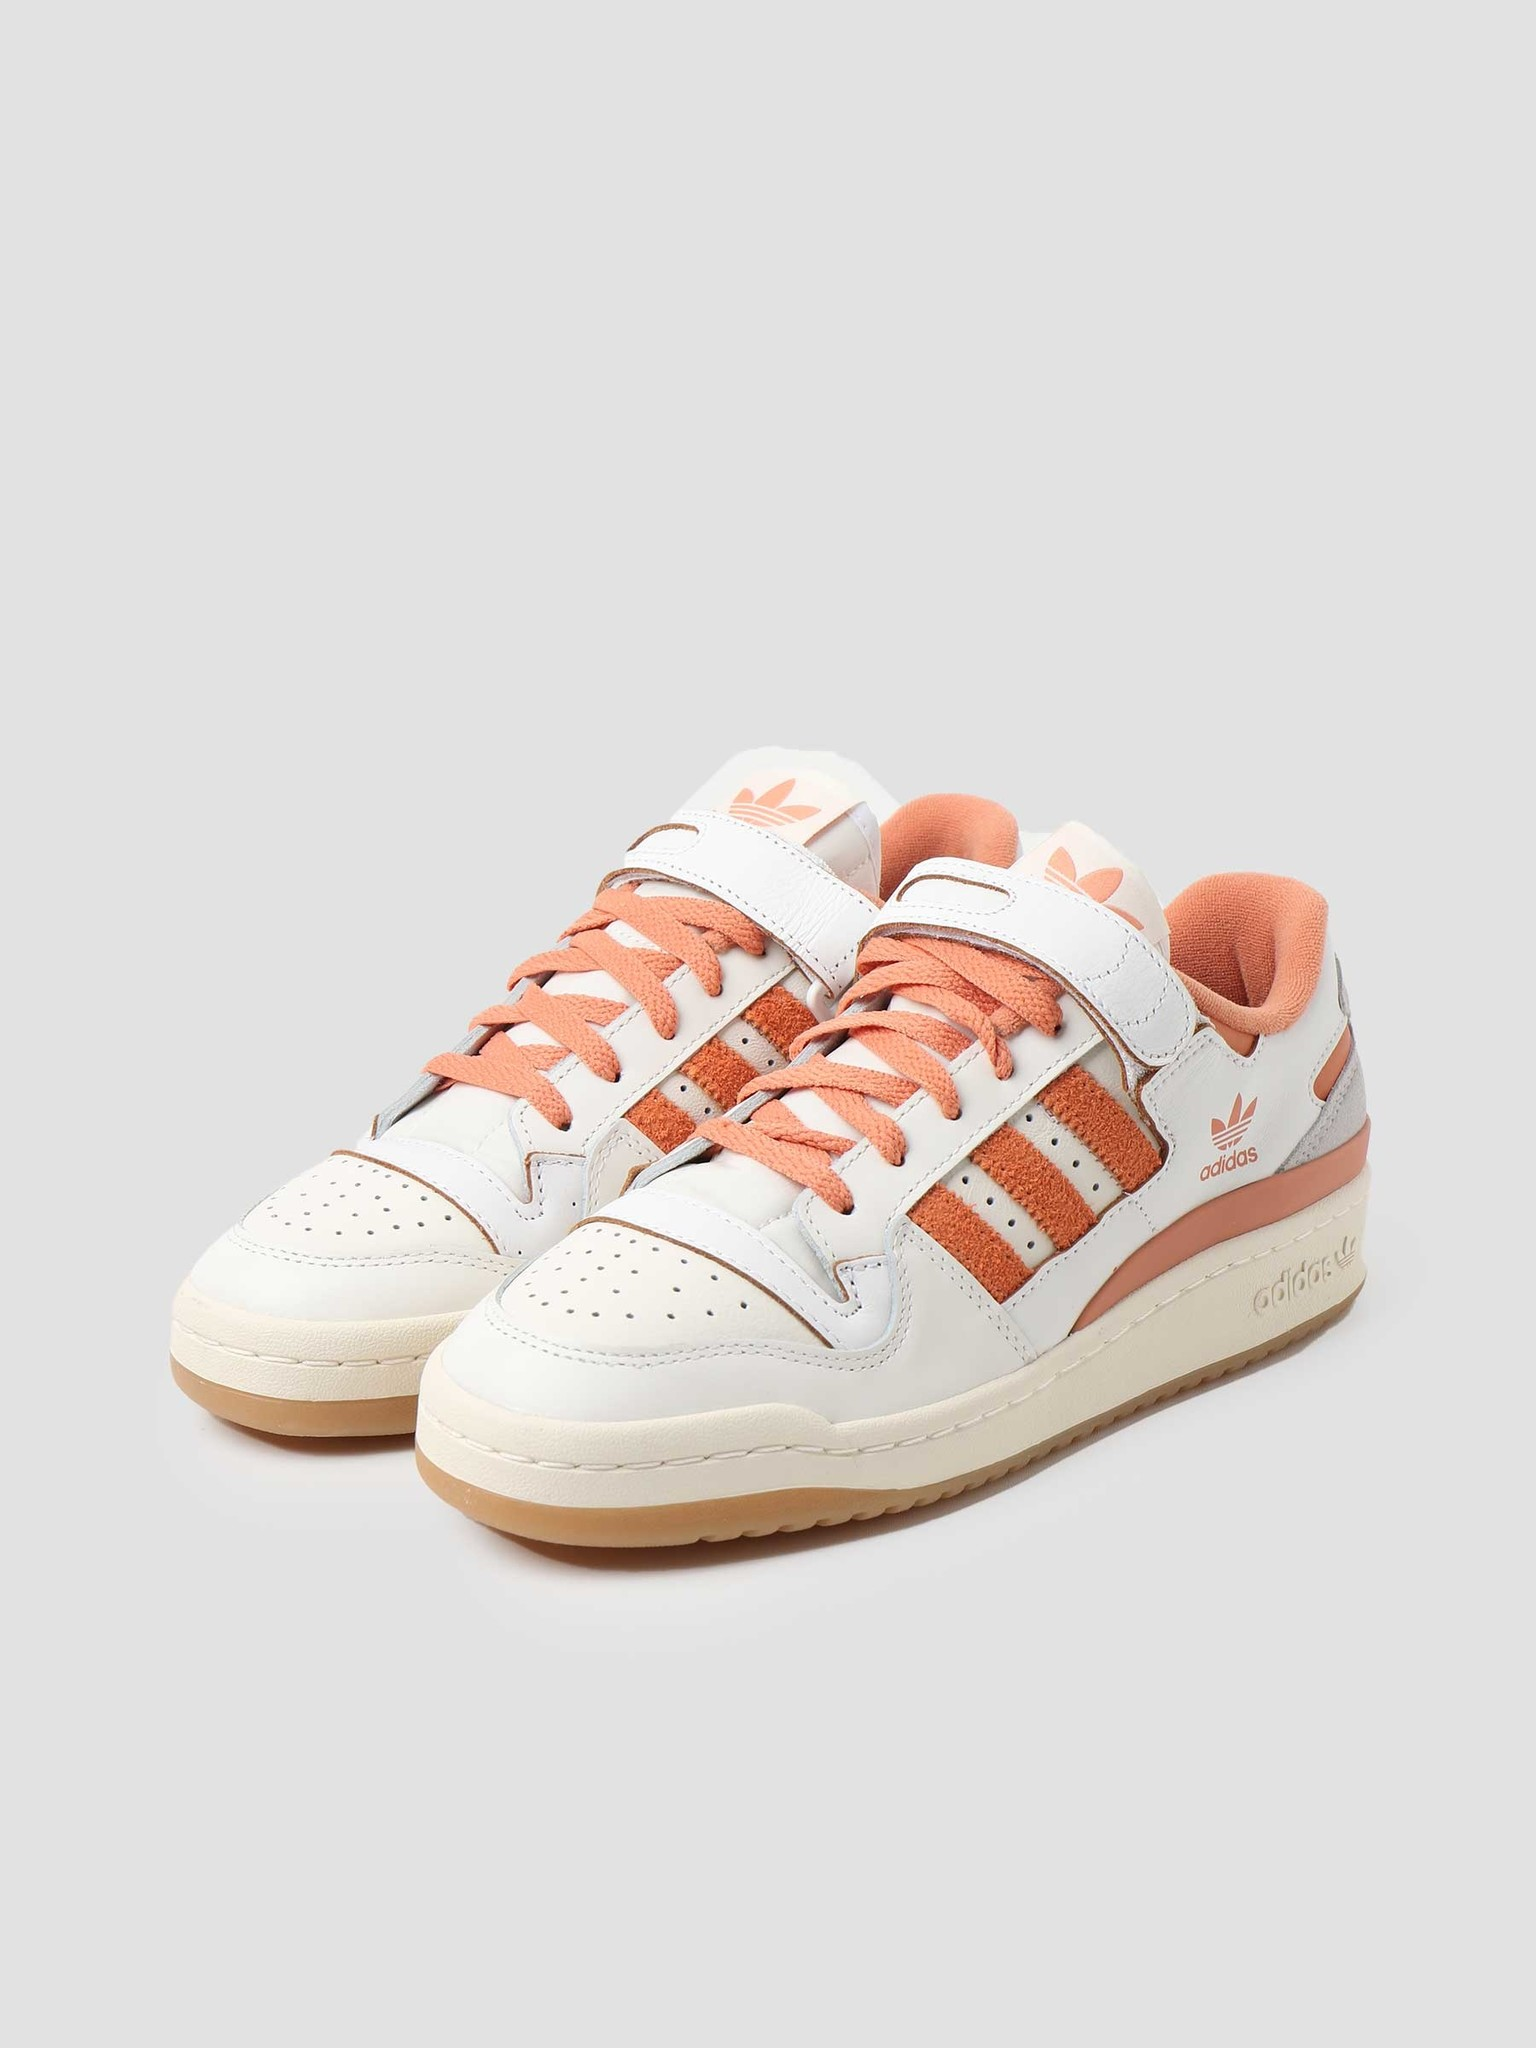 adidas adidas Forum 84 Low Ftwr White Hazy Copper Core White G57966